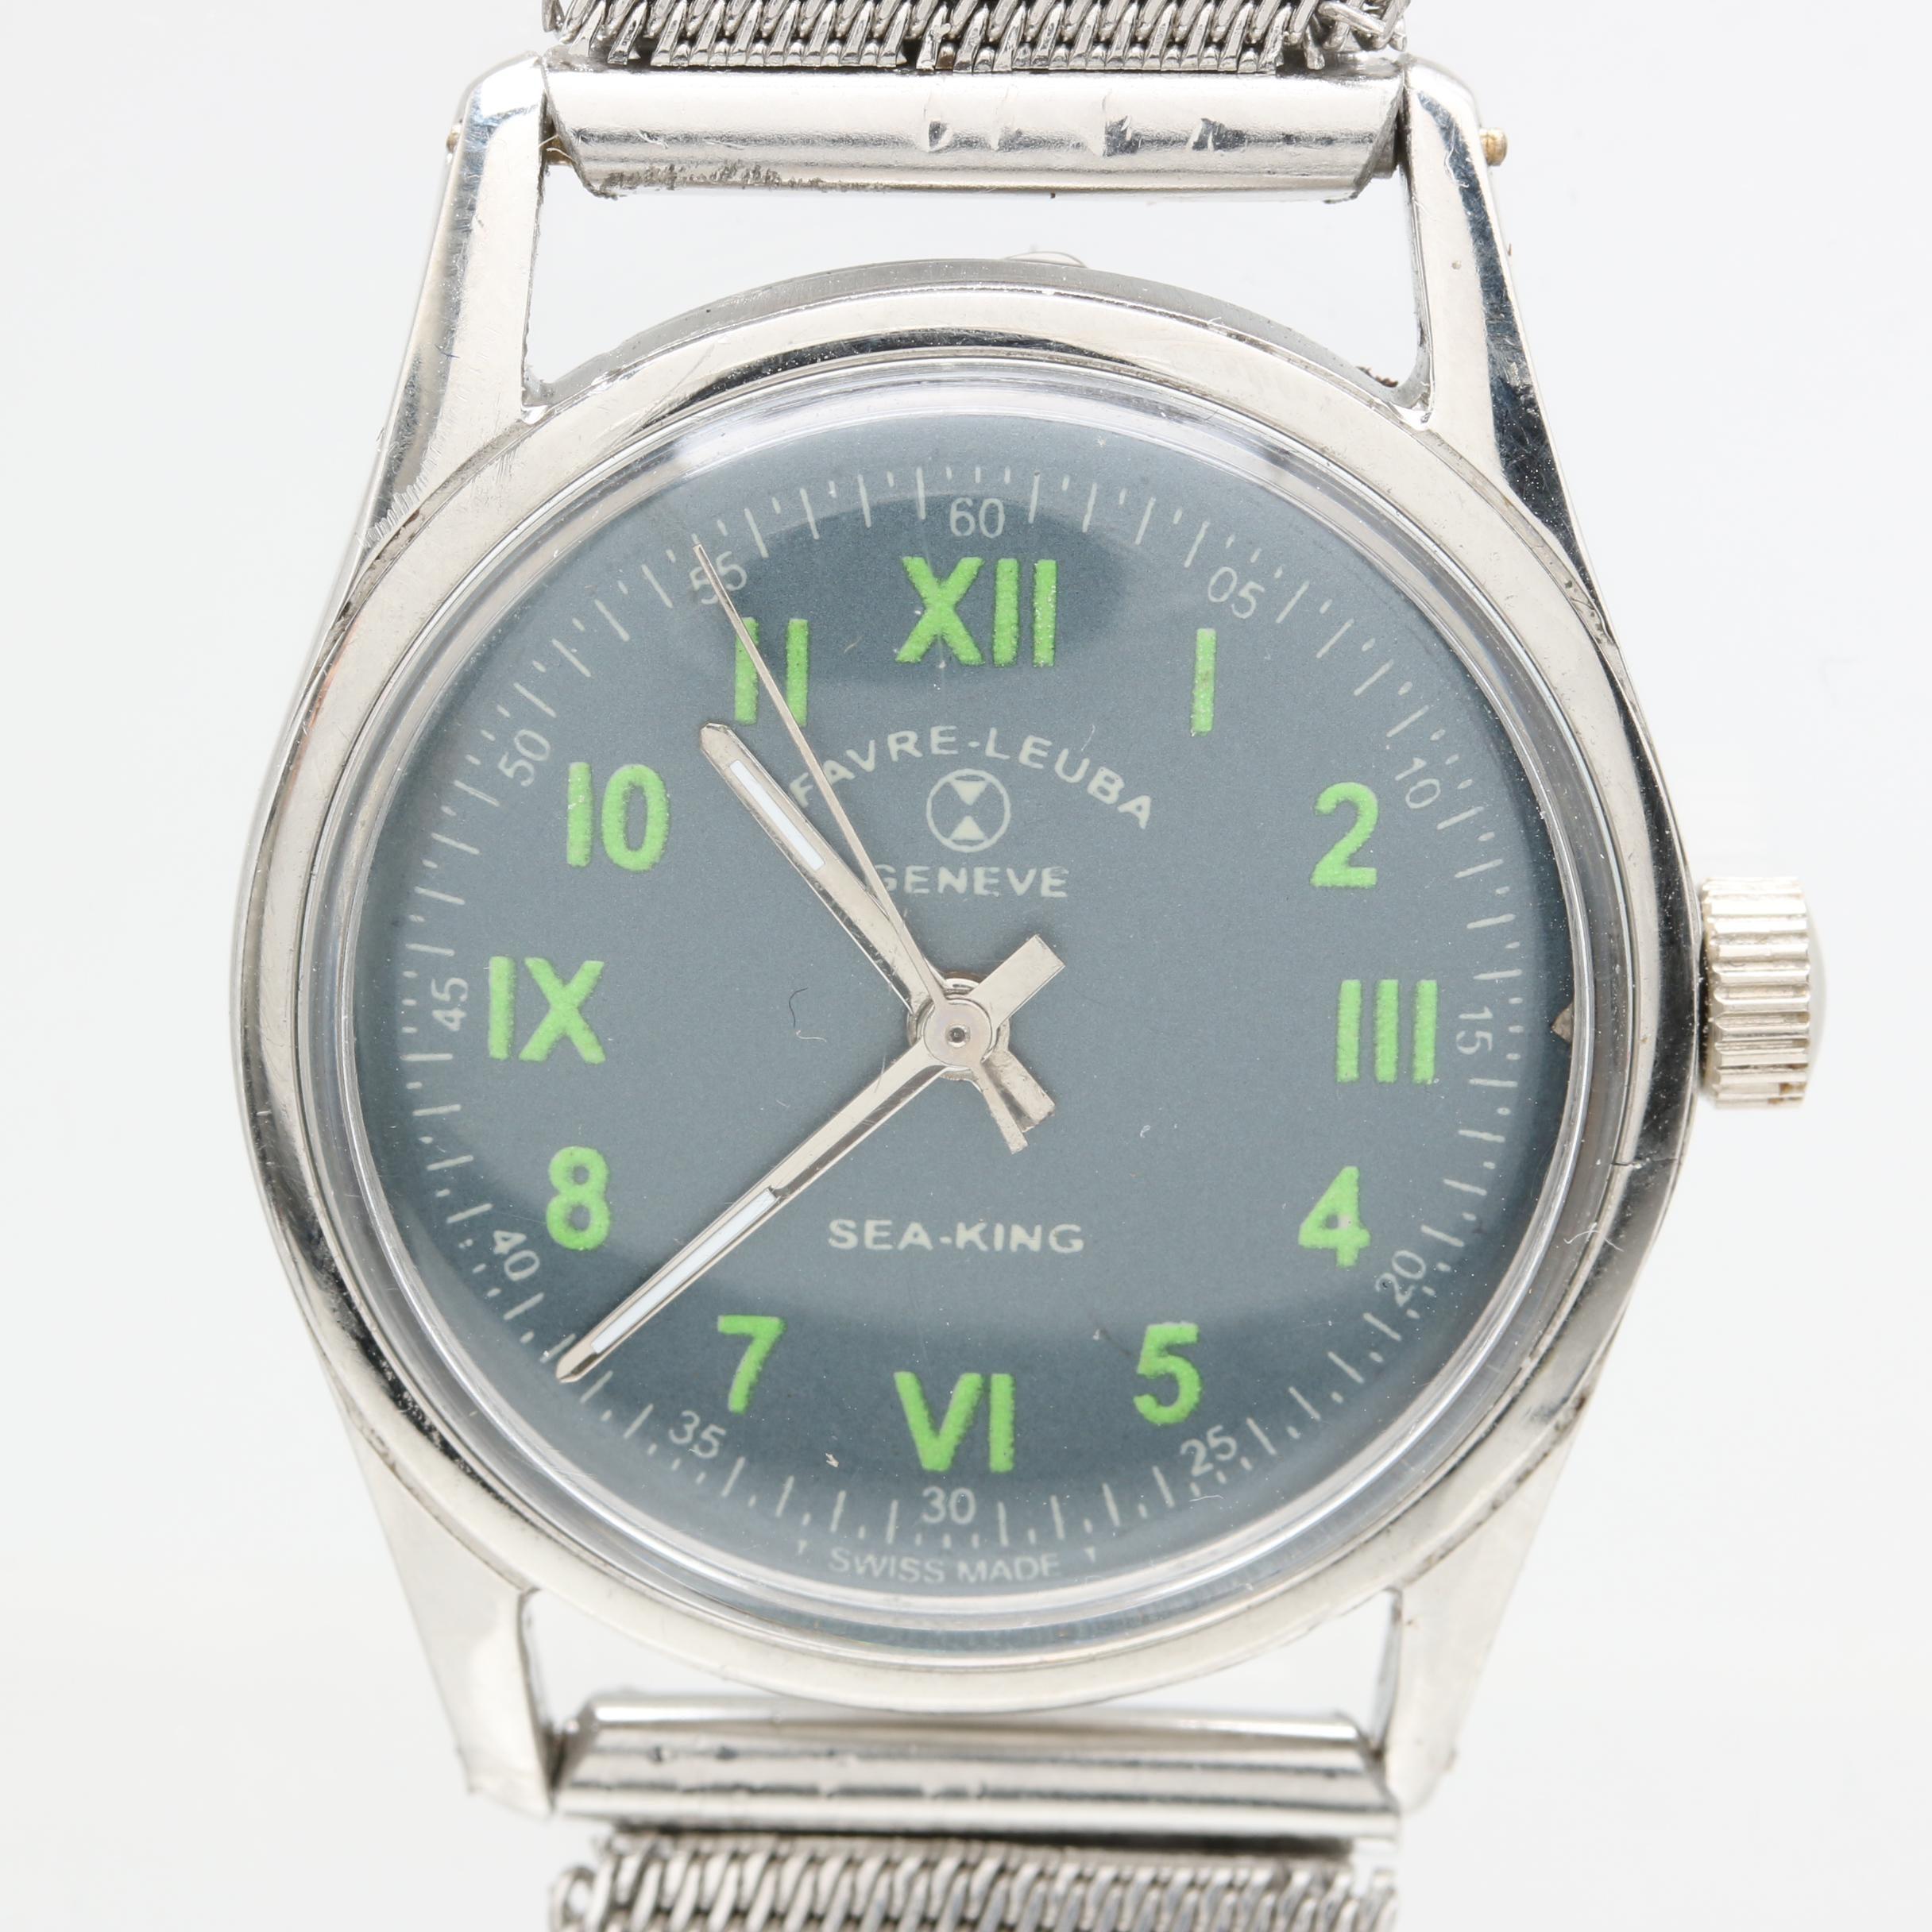 Favre-Leuba Stainless Steel Wristwatch